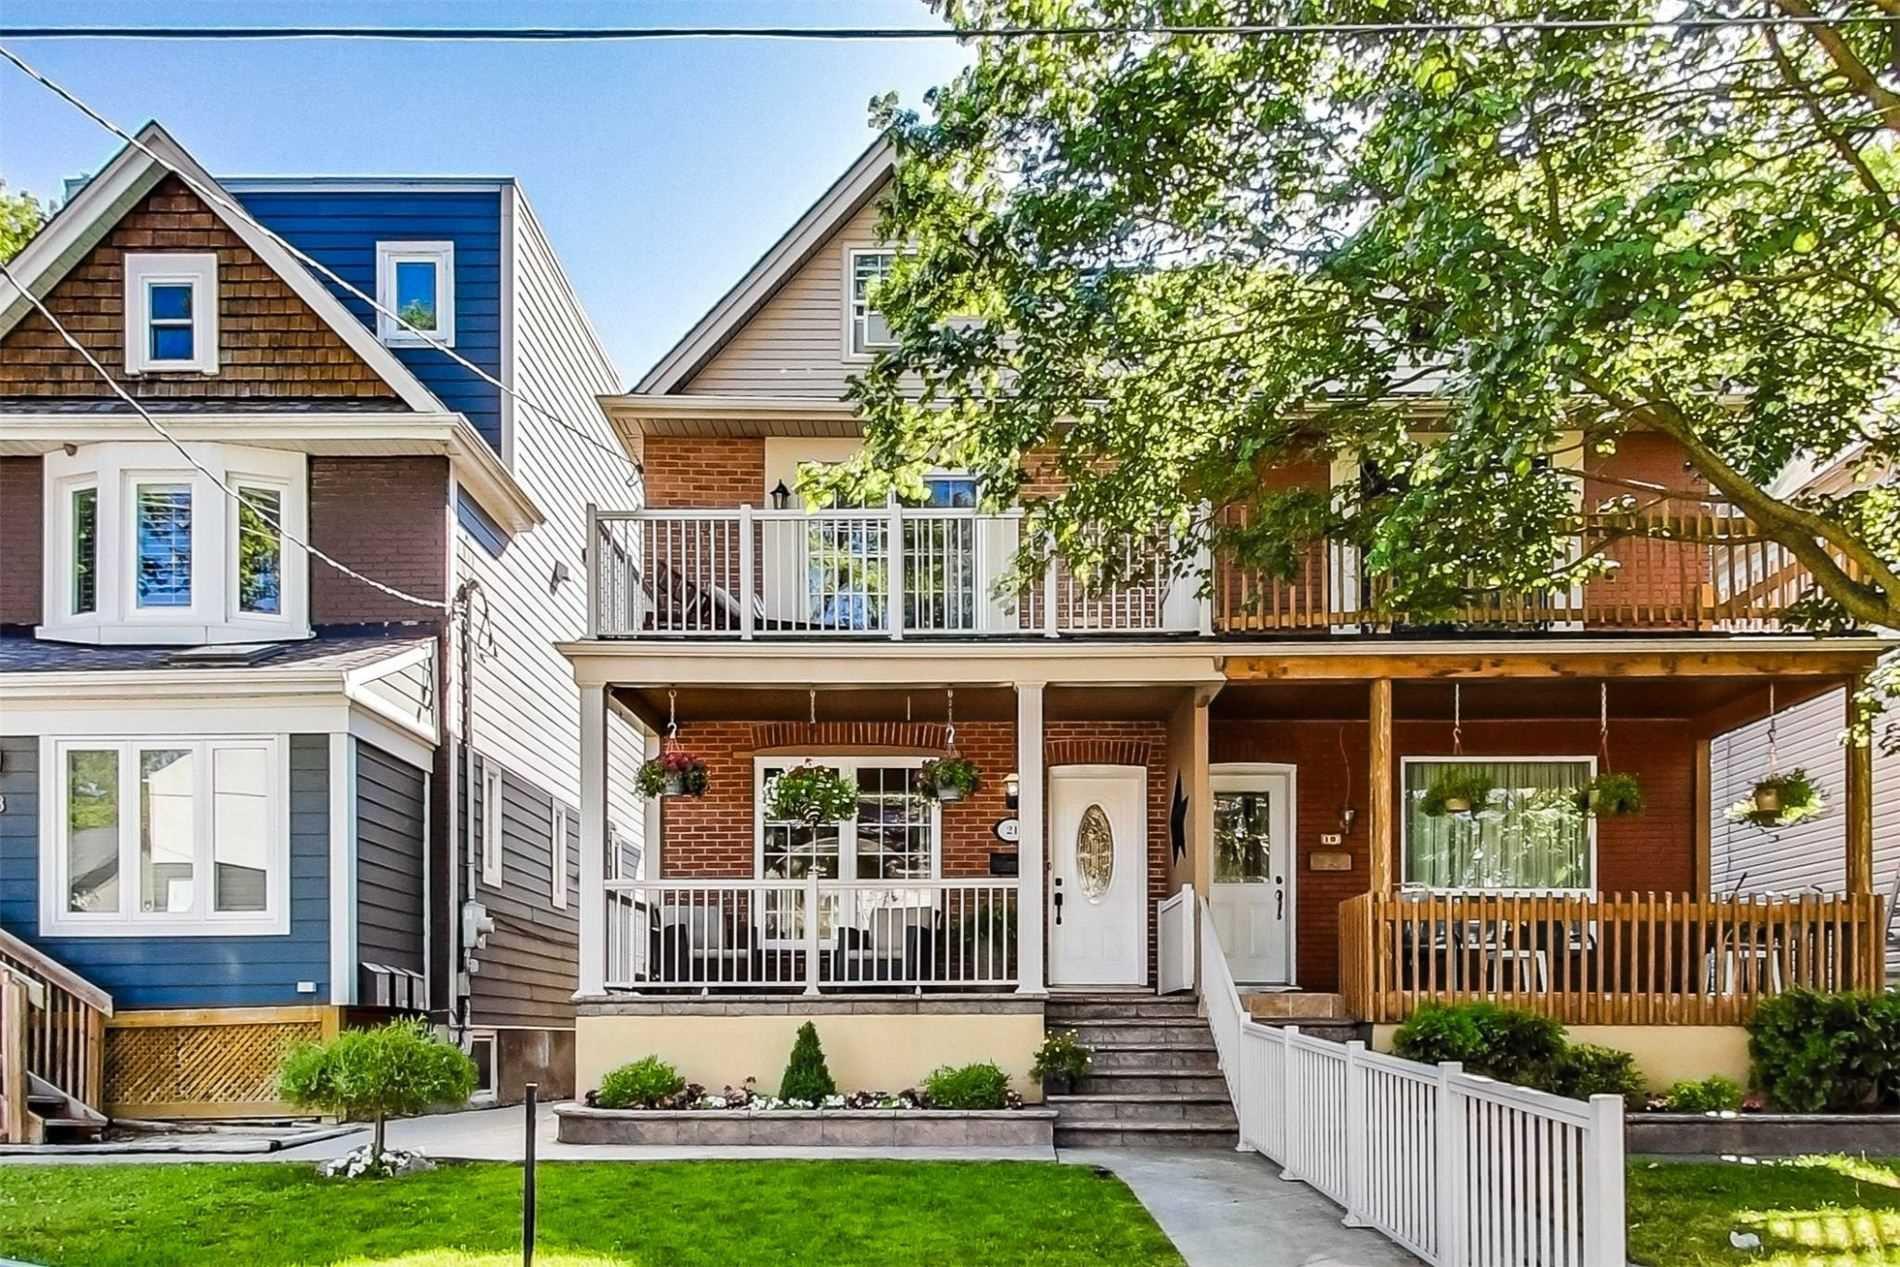 Main Photo: 21 Woodfield Road in Toronto: Greenwood-Coxwell House (3-Storey) for sale (Toronto E01)  : MLS®# E4838280